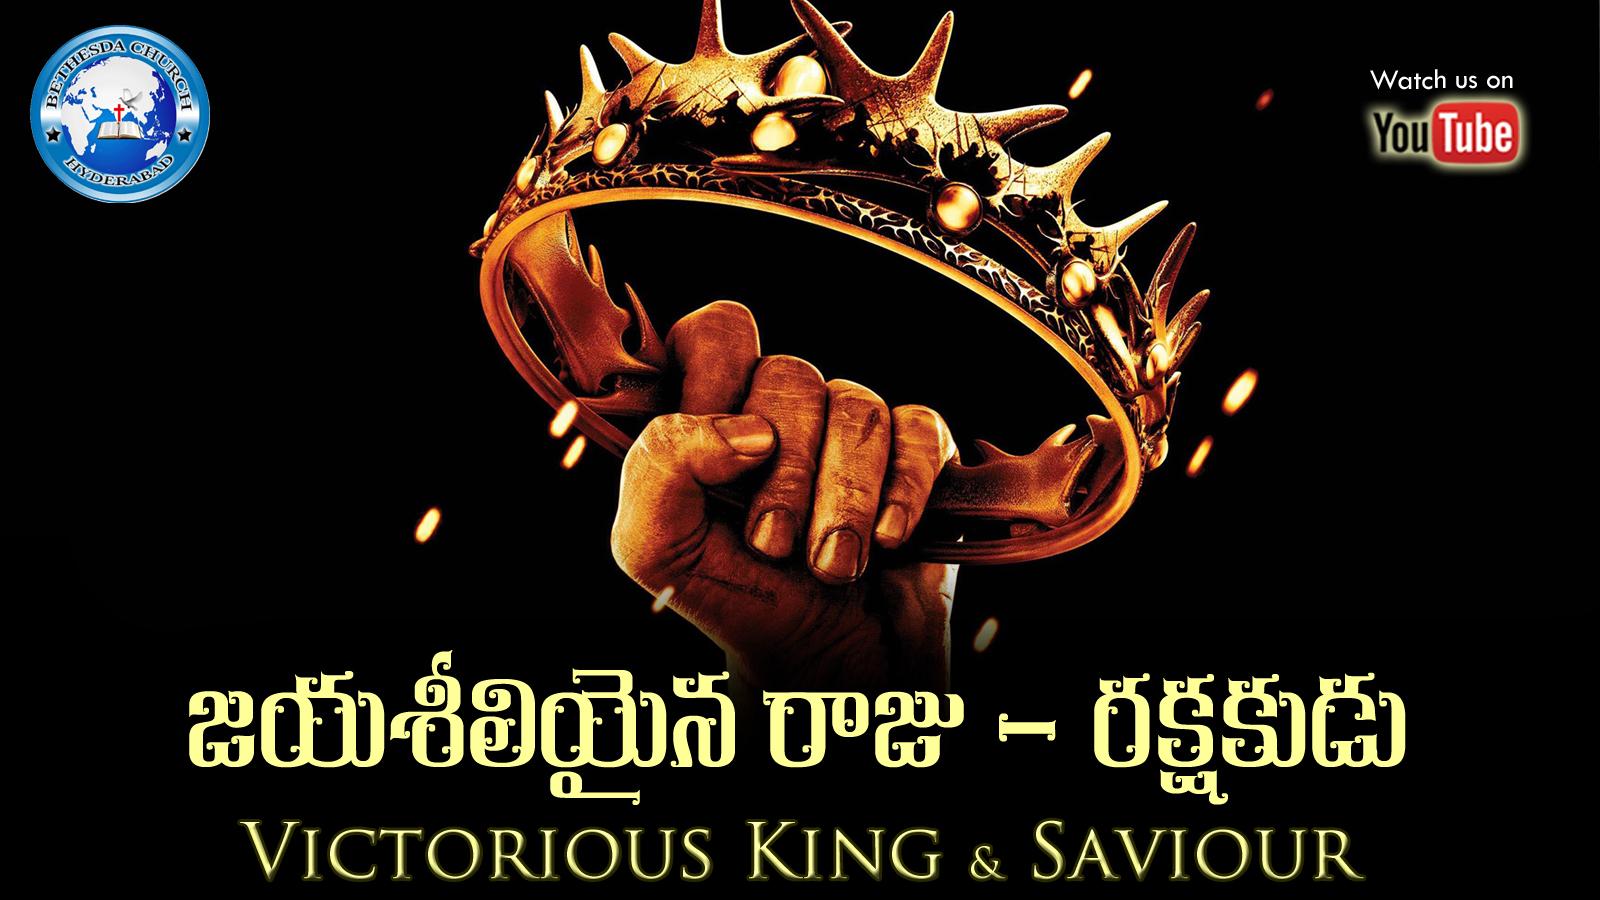 Victorious King & Savior (A246)